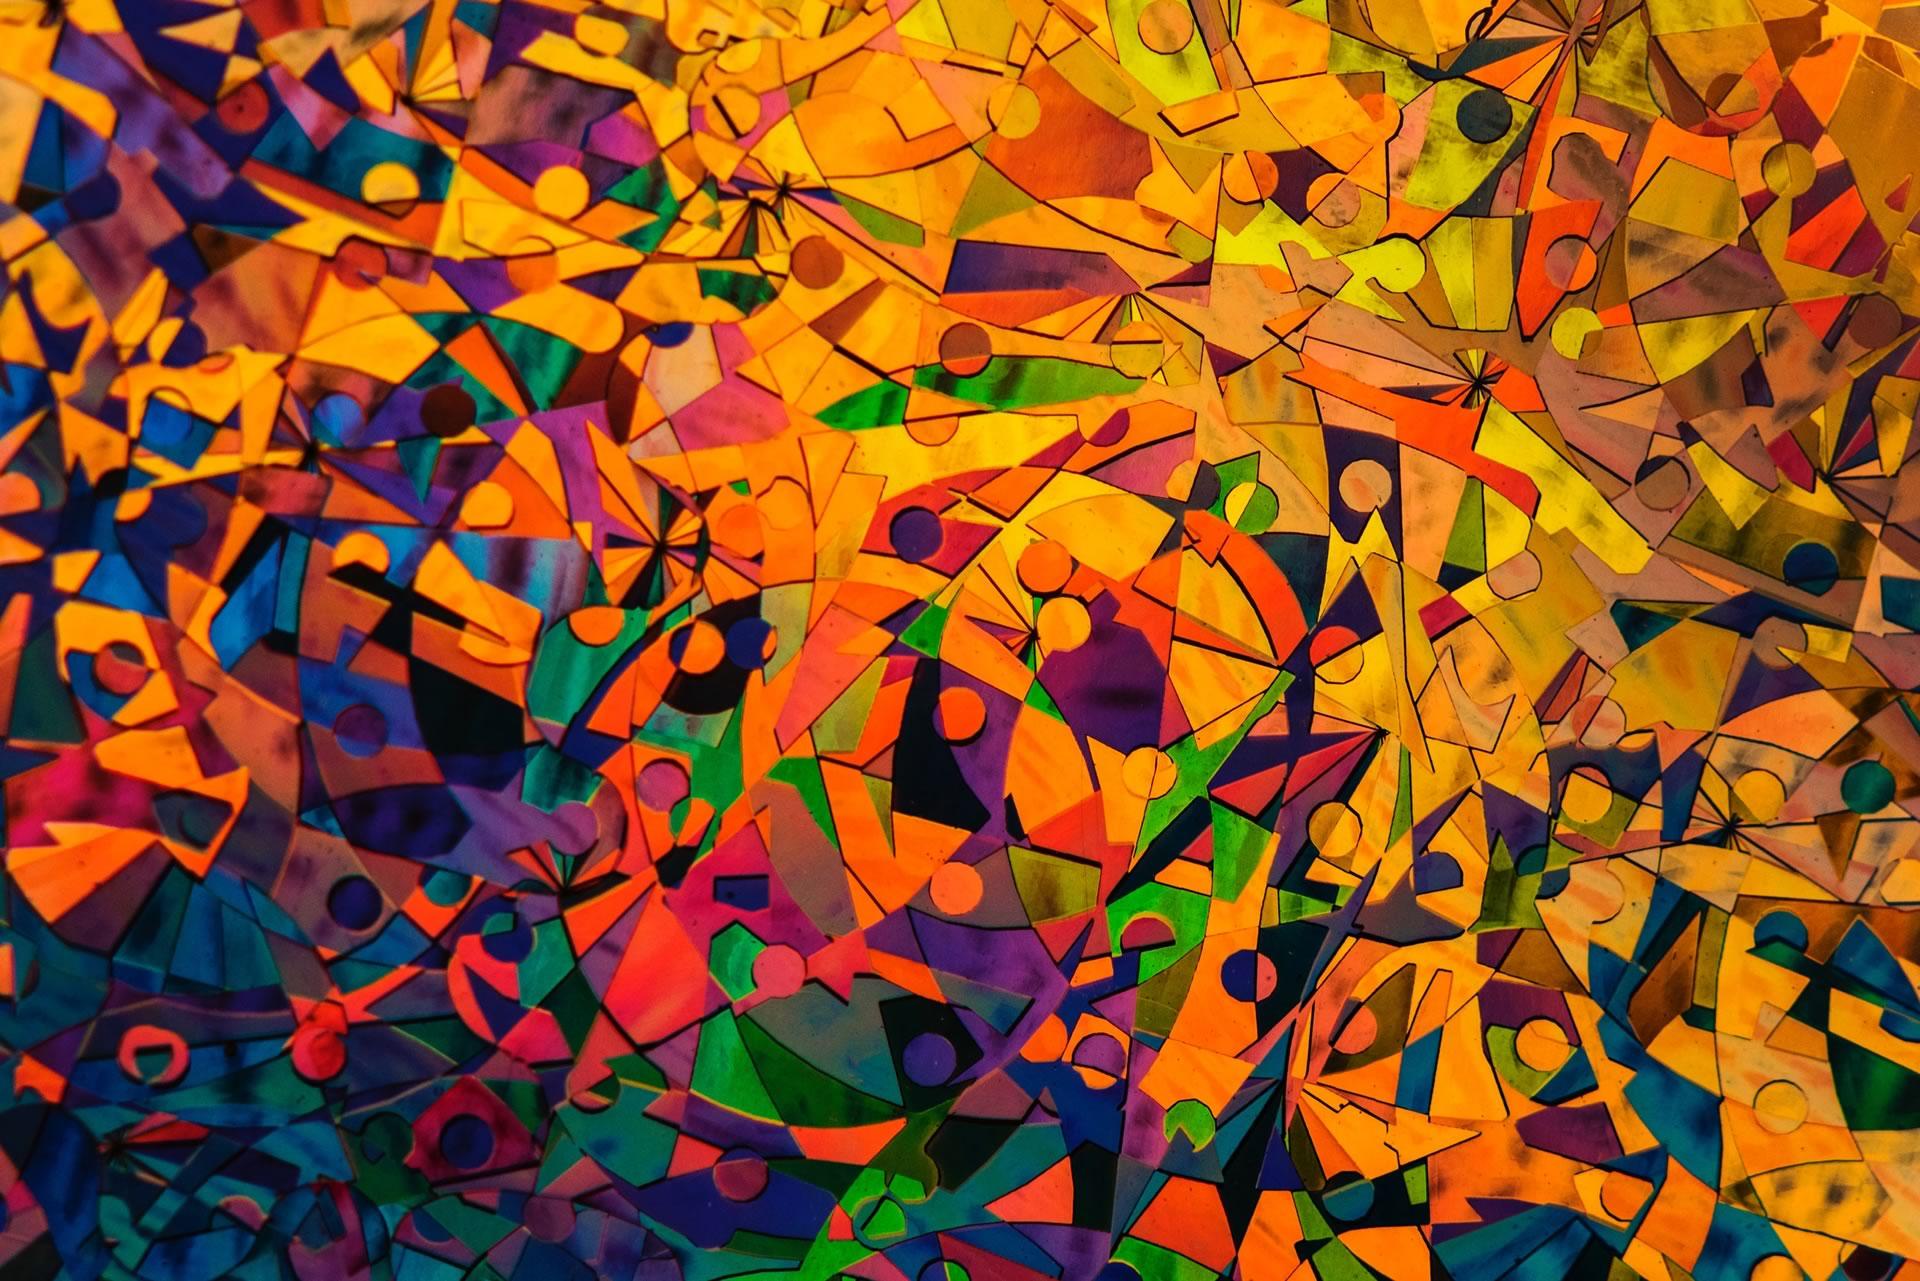 download wallpaper: kleurig mozaiek wallpaper